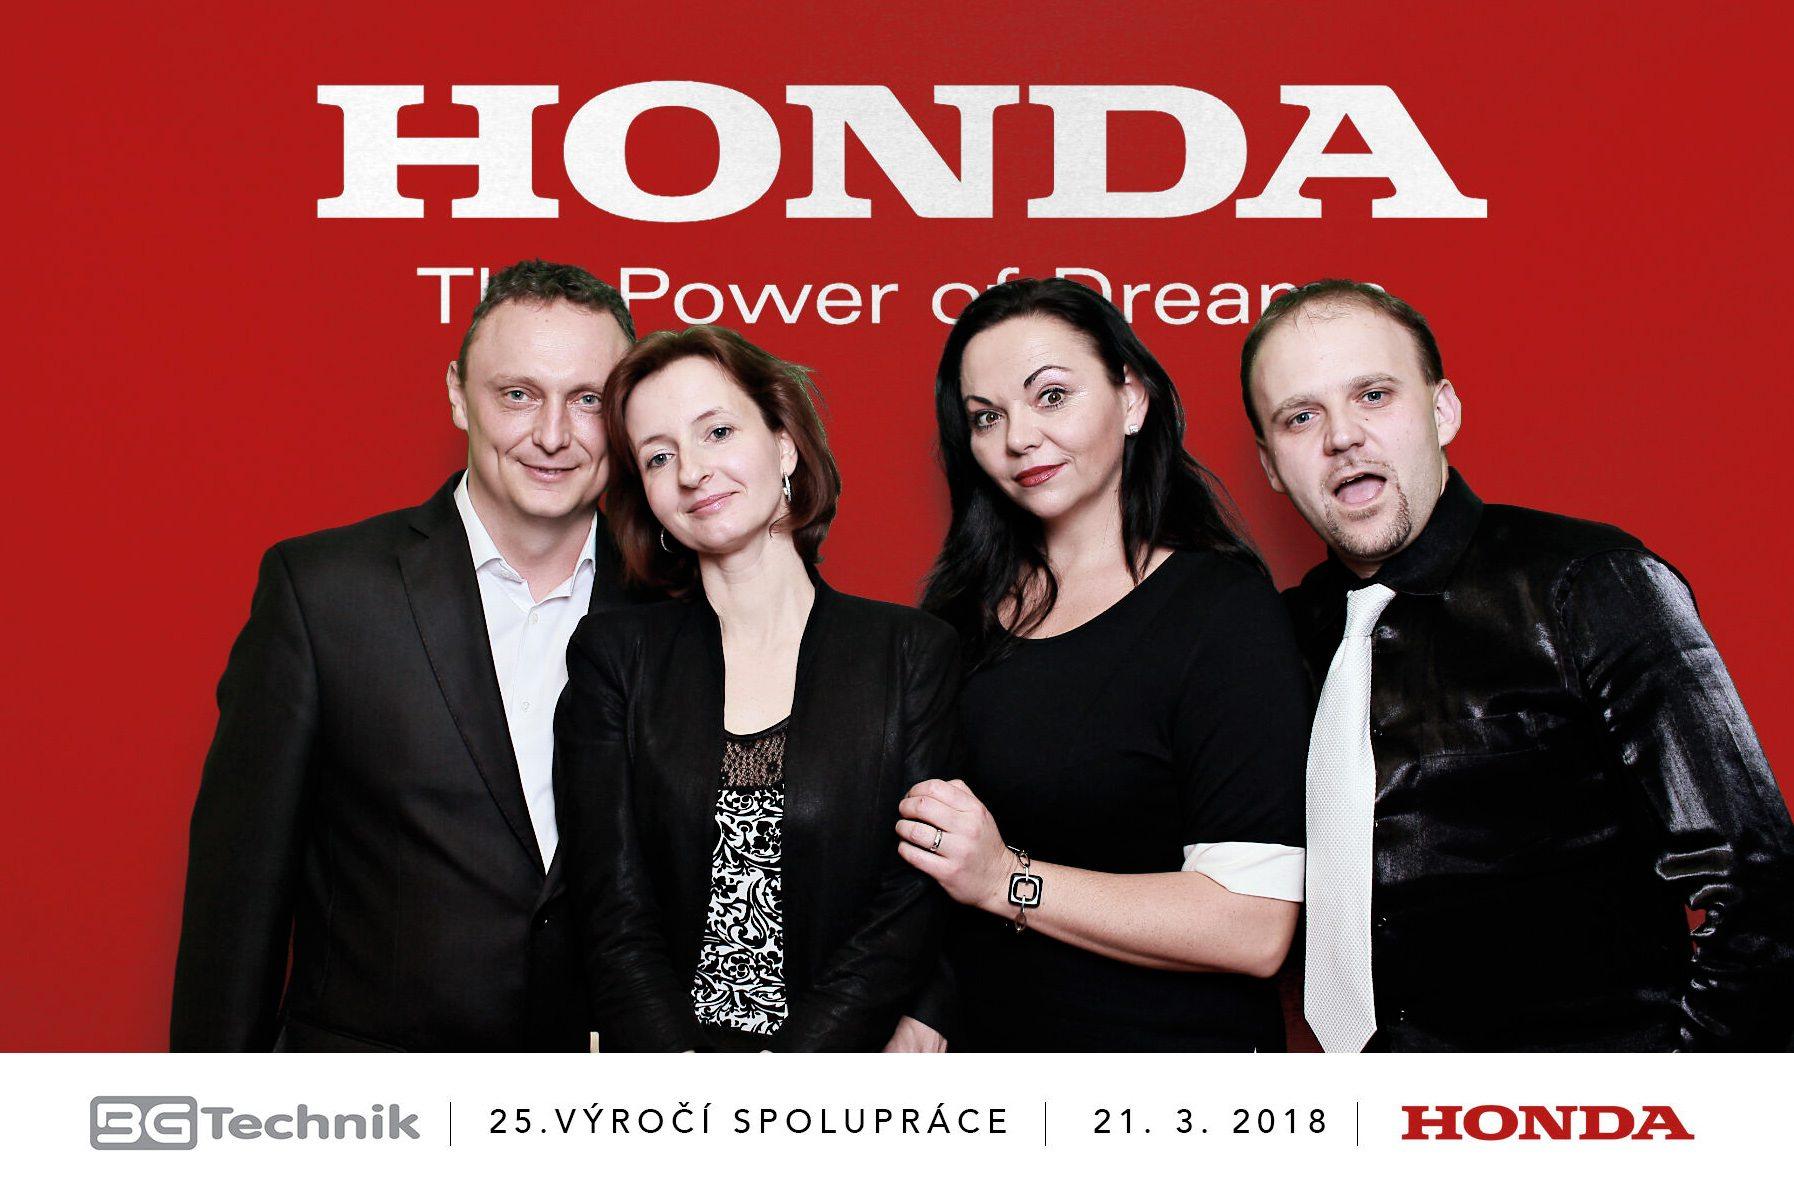 fotokoutek-honda-21-3-2018-403014